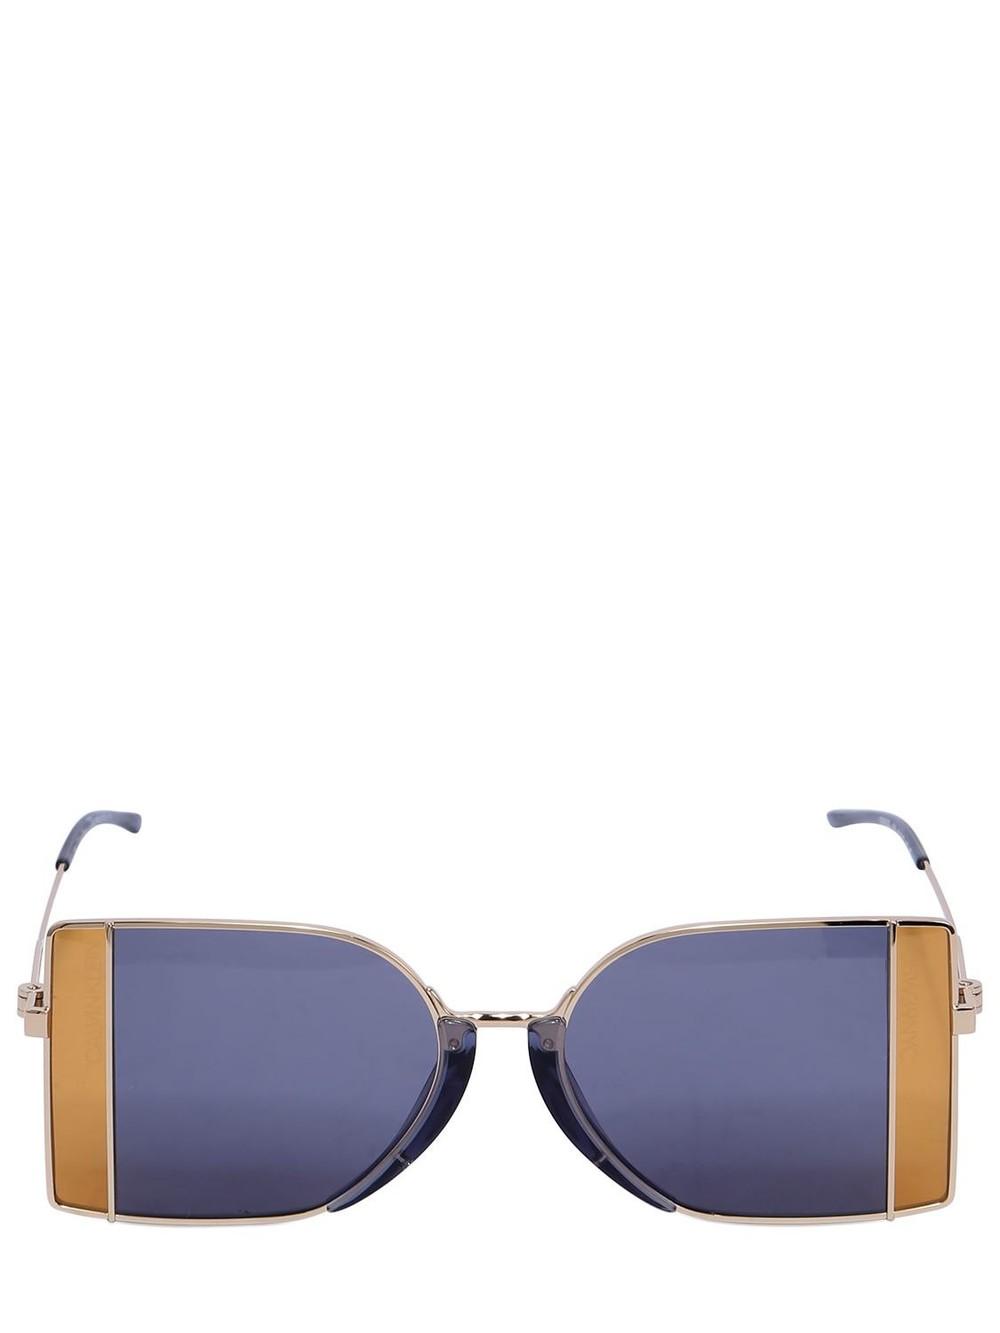 CALVIN KLEIN 205W39NYC Squared See-thru Lens Sunglasses in blue / orange